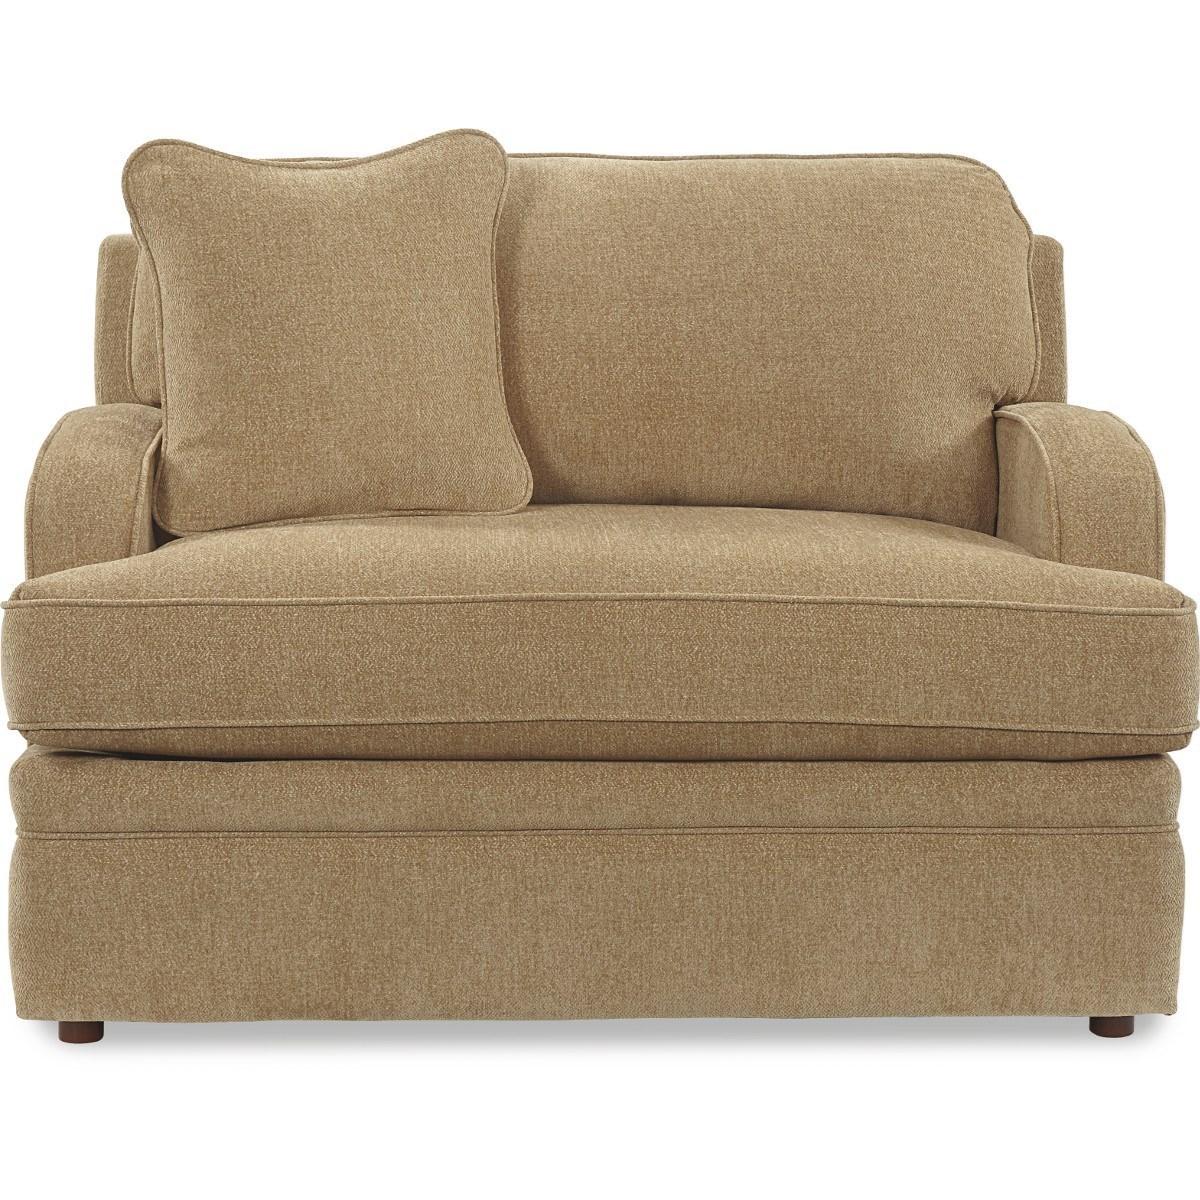 Beau La Z Boy DianaSUPREME COMFORT??Twin Sleep Chair ...